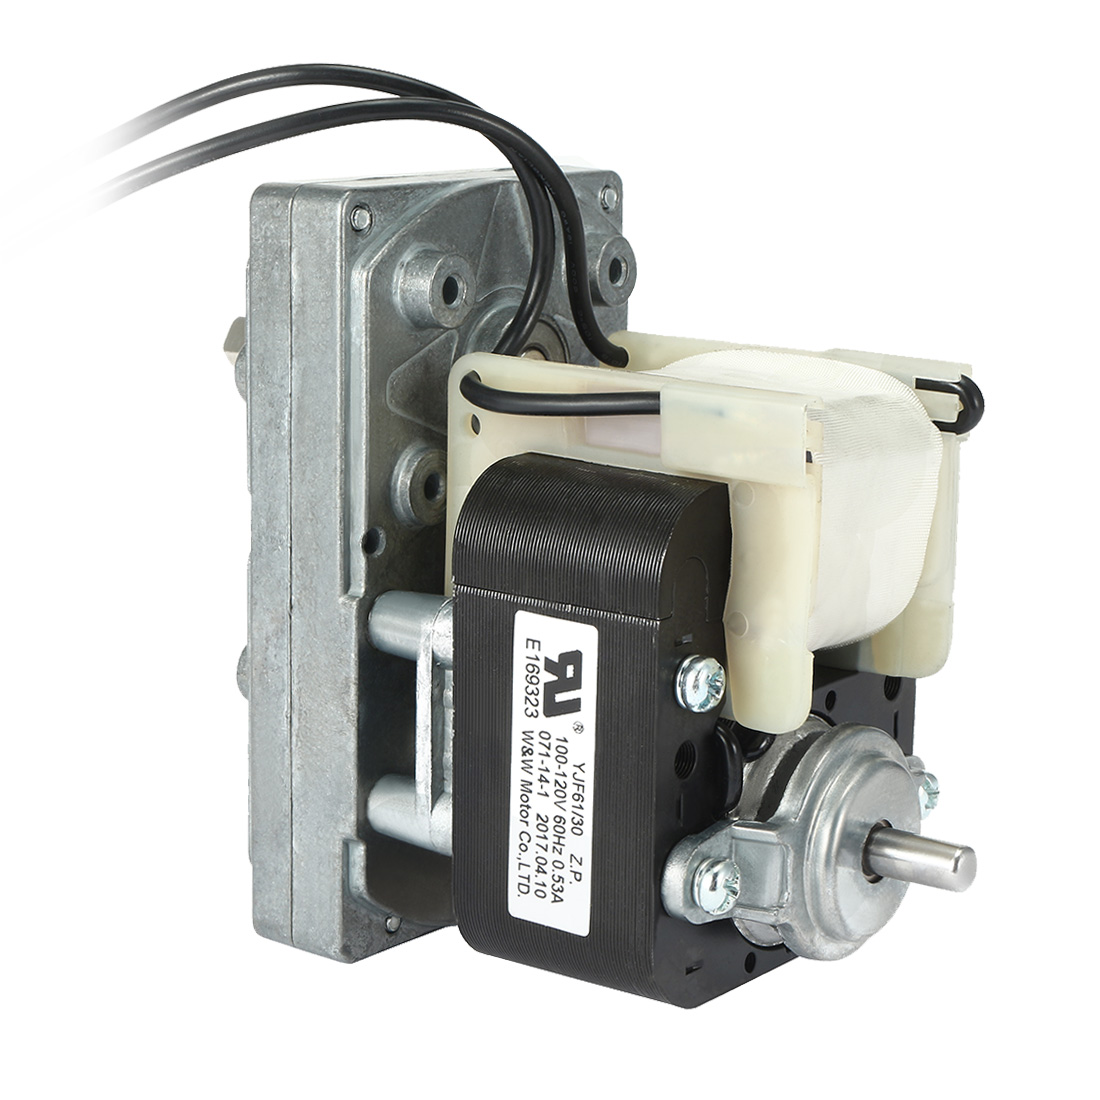 FC-YJ61 AC100V-120V 60Hz 3RPM CW Shaded Pole Motor Universal Geared Motor